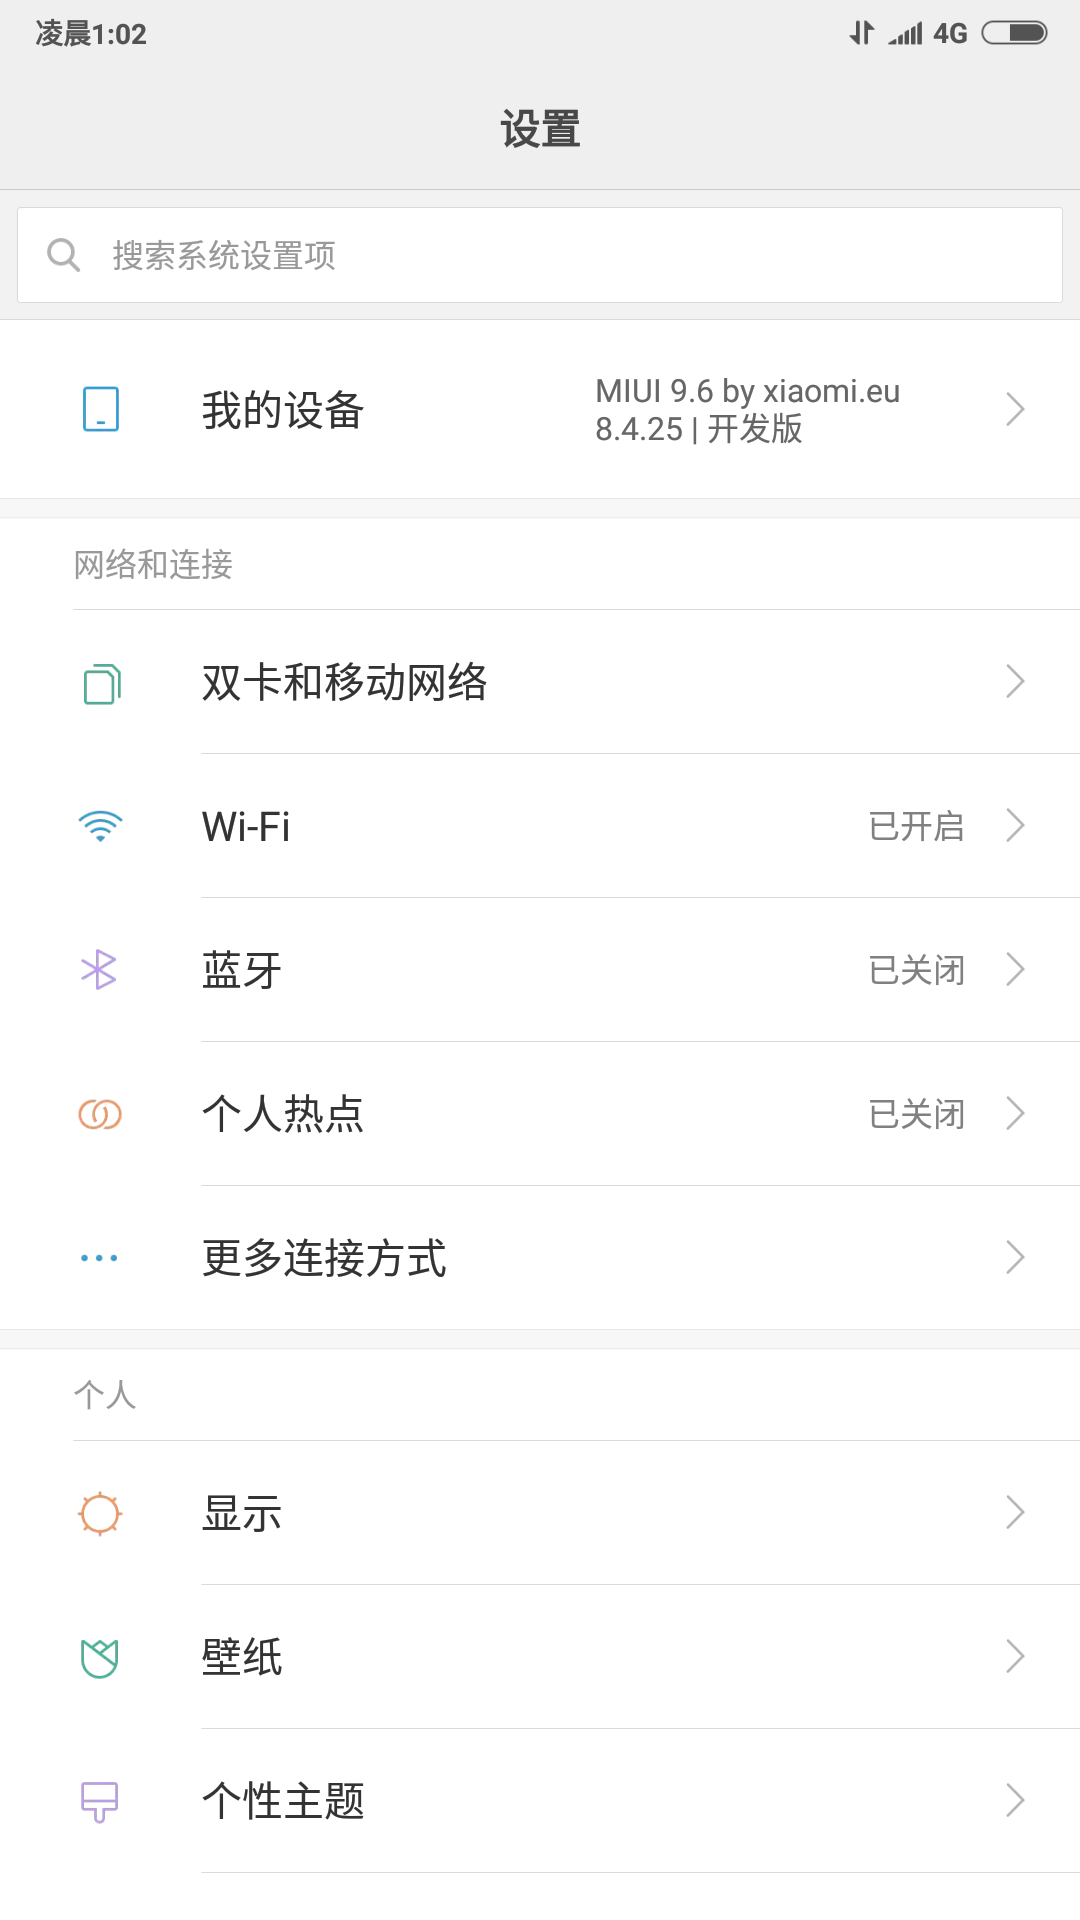 Screenshot_2018-04-26-01-02-25-078_com.android.settings.png